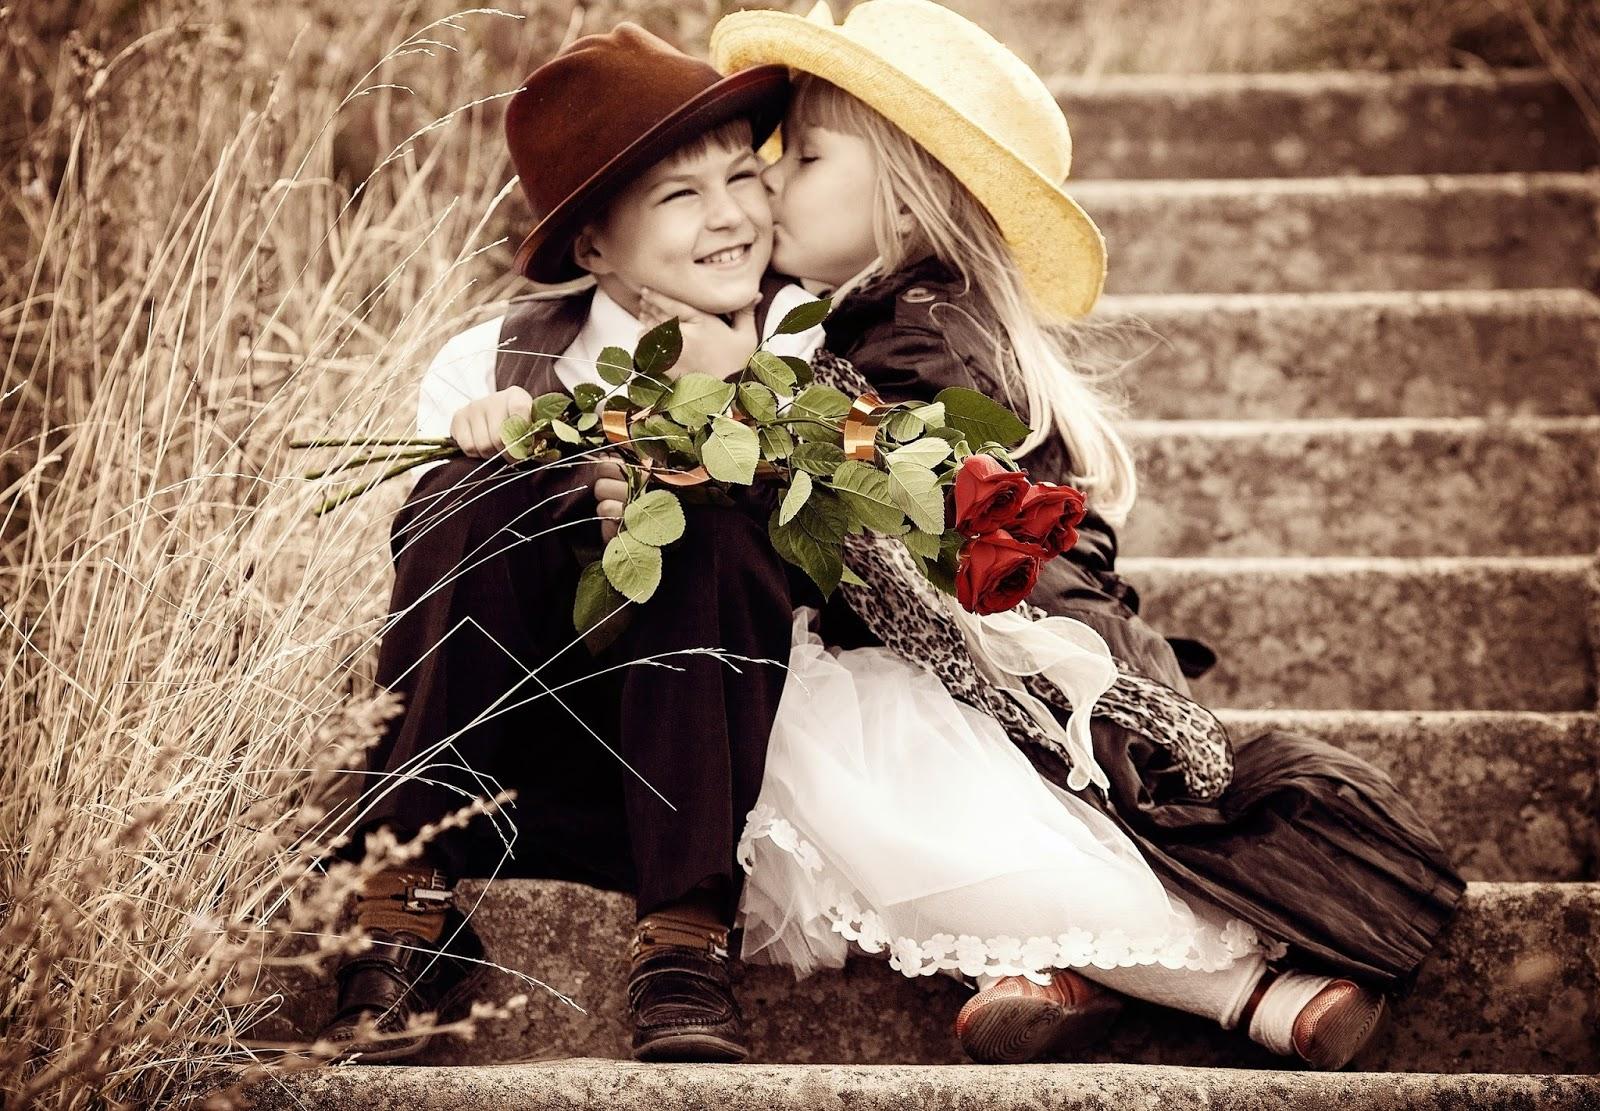 3d Sad Shayari Wallpaper Best 68 Wallpapers Of Romantic Boy And Girl In Love Kiss